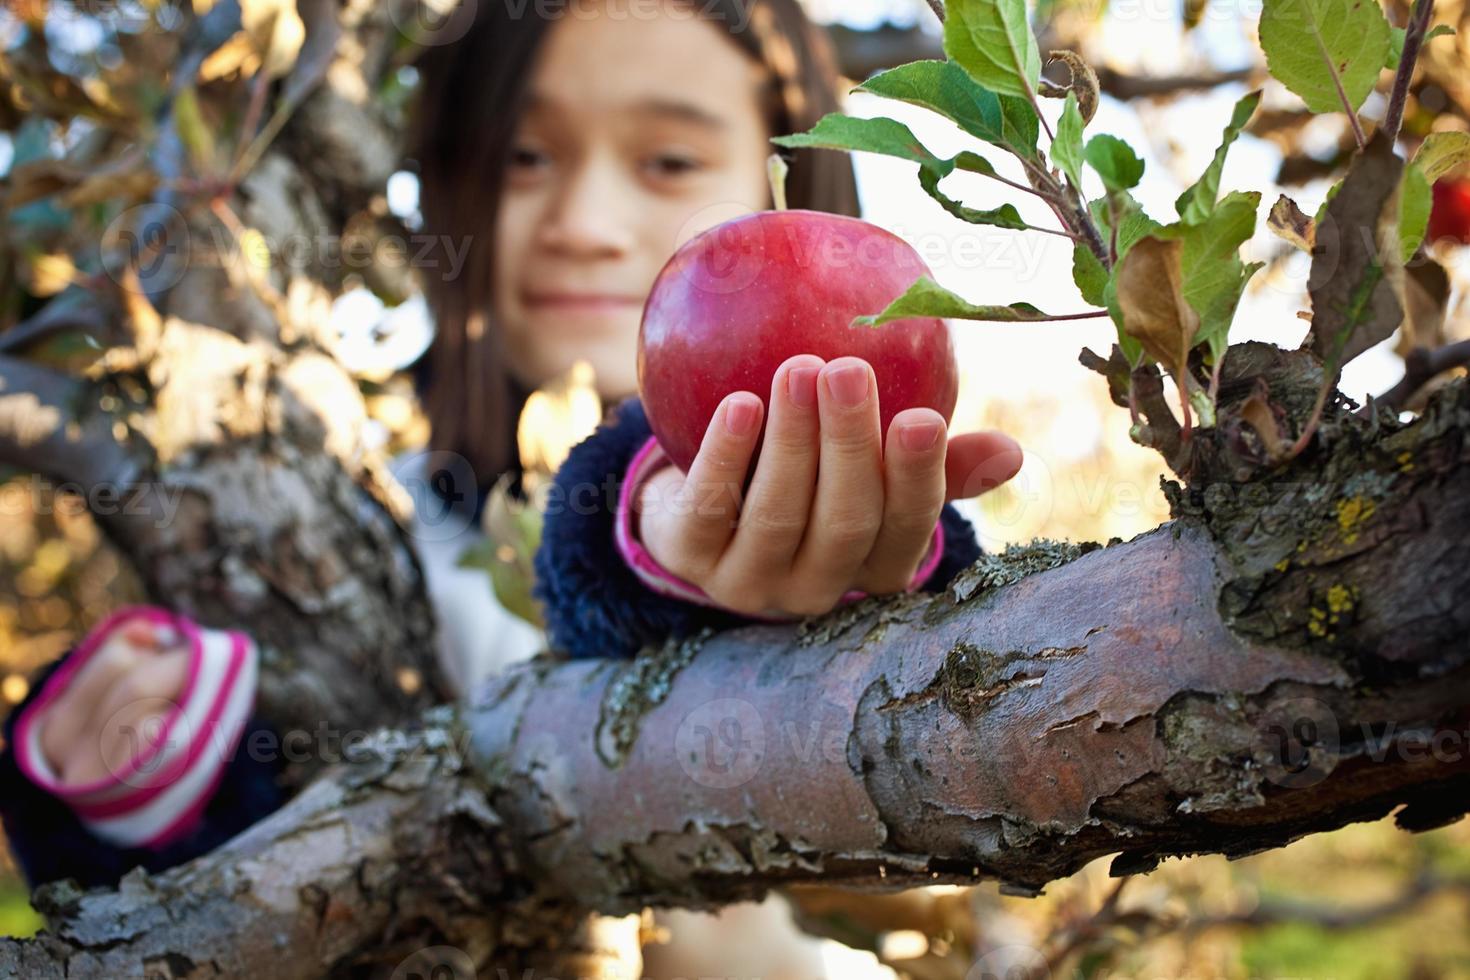 Apfel pflücken foto